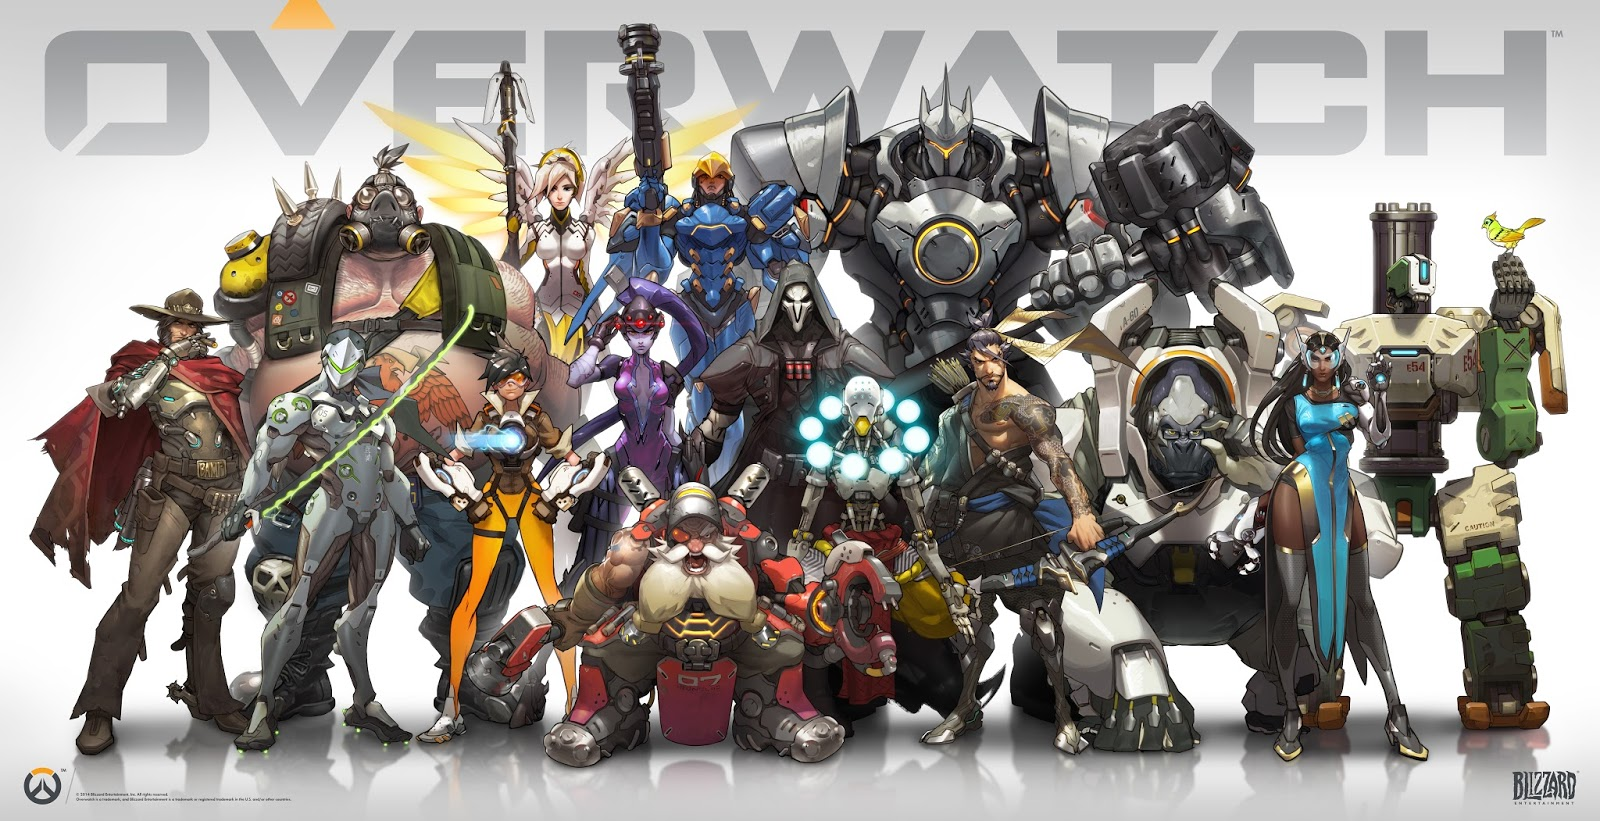 Programa 9x27 (13-05-2016) 'Overwatch beta' Overwatch_poster_final